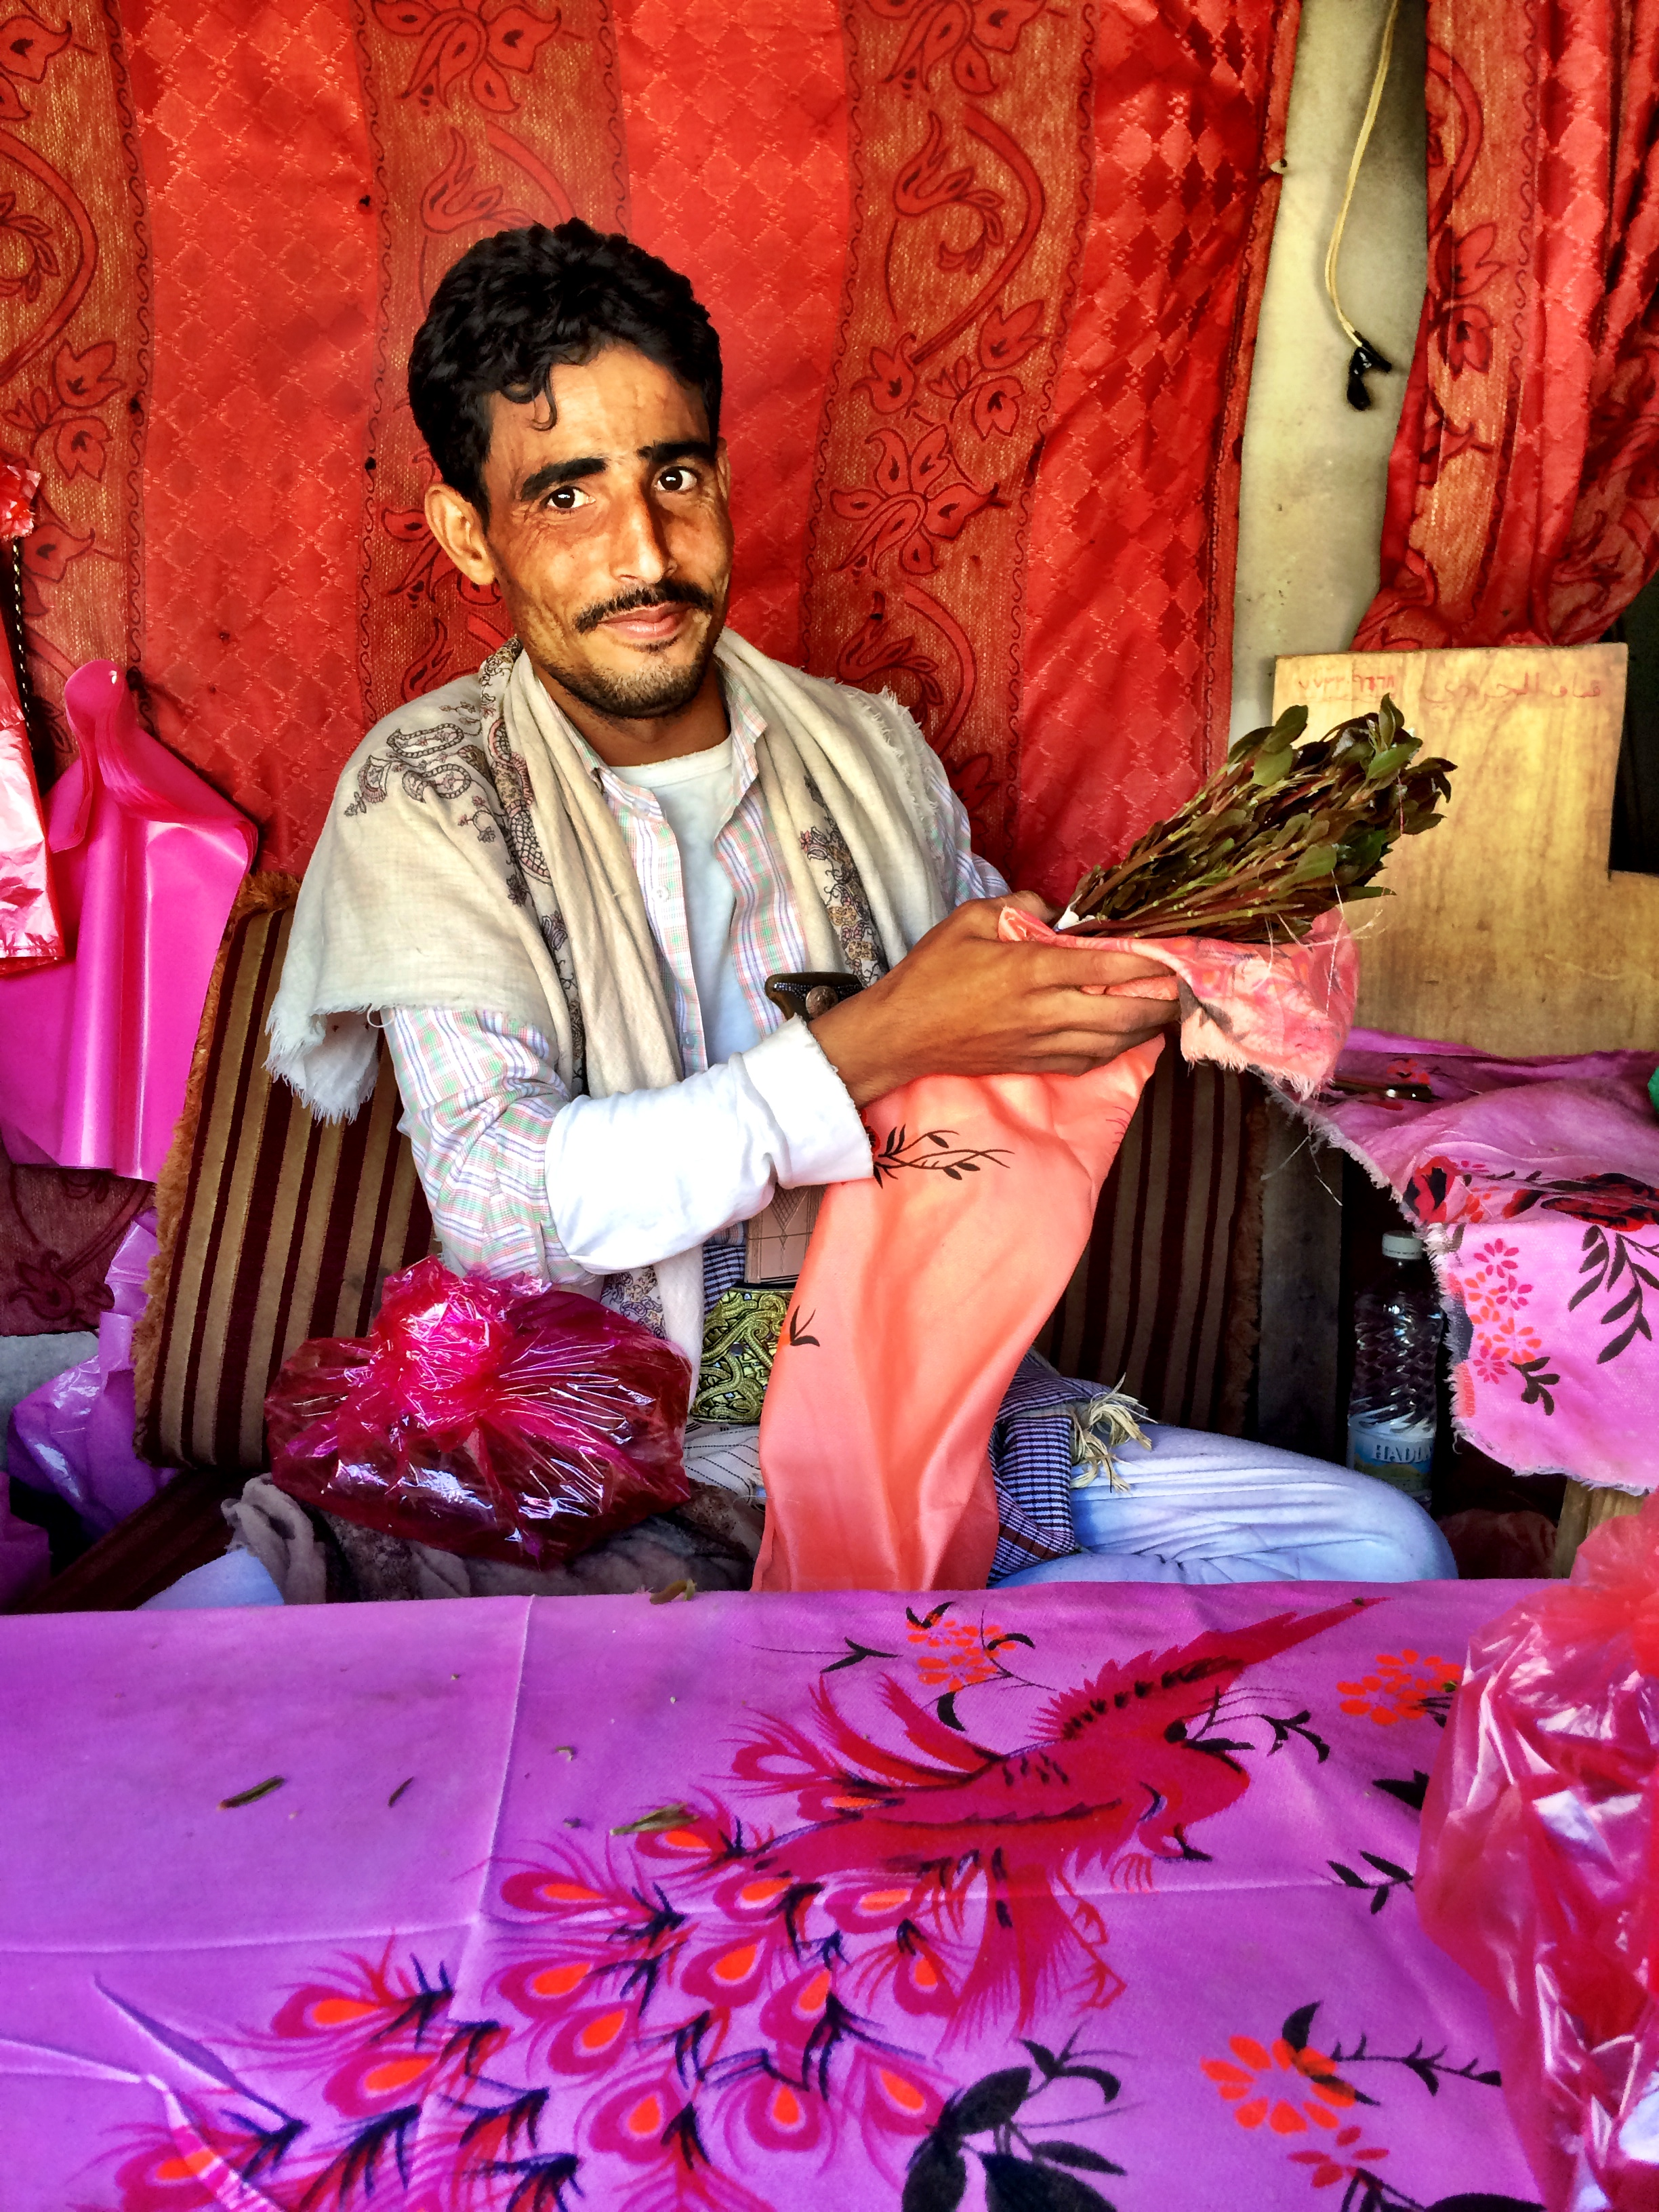 A Qat seller in Sanaa. Photo by: Lucy Kafanov